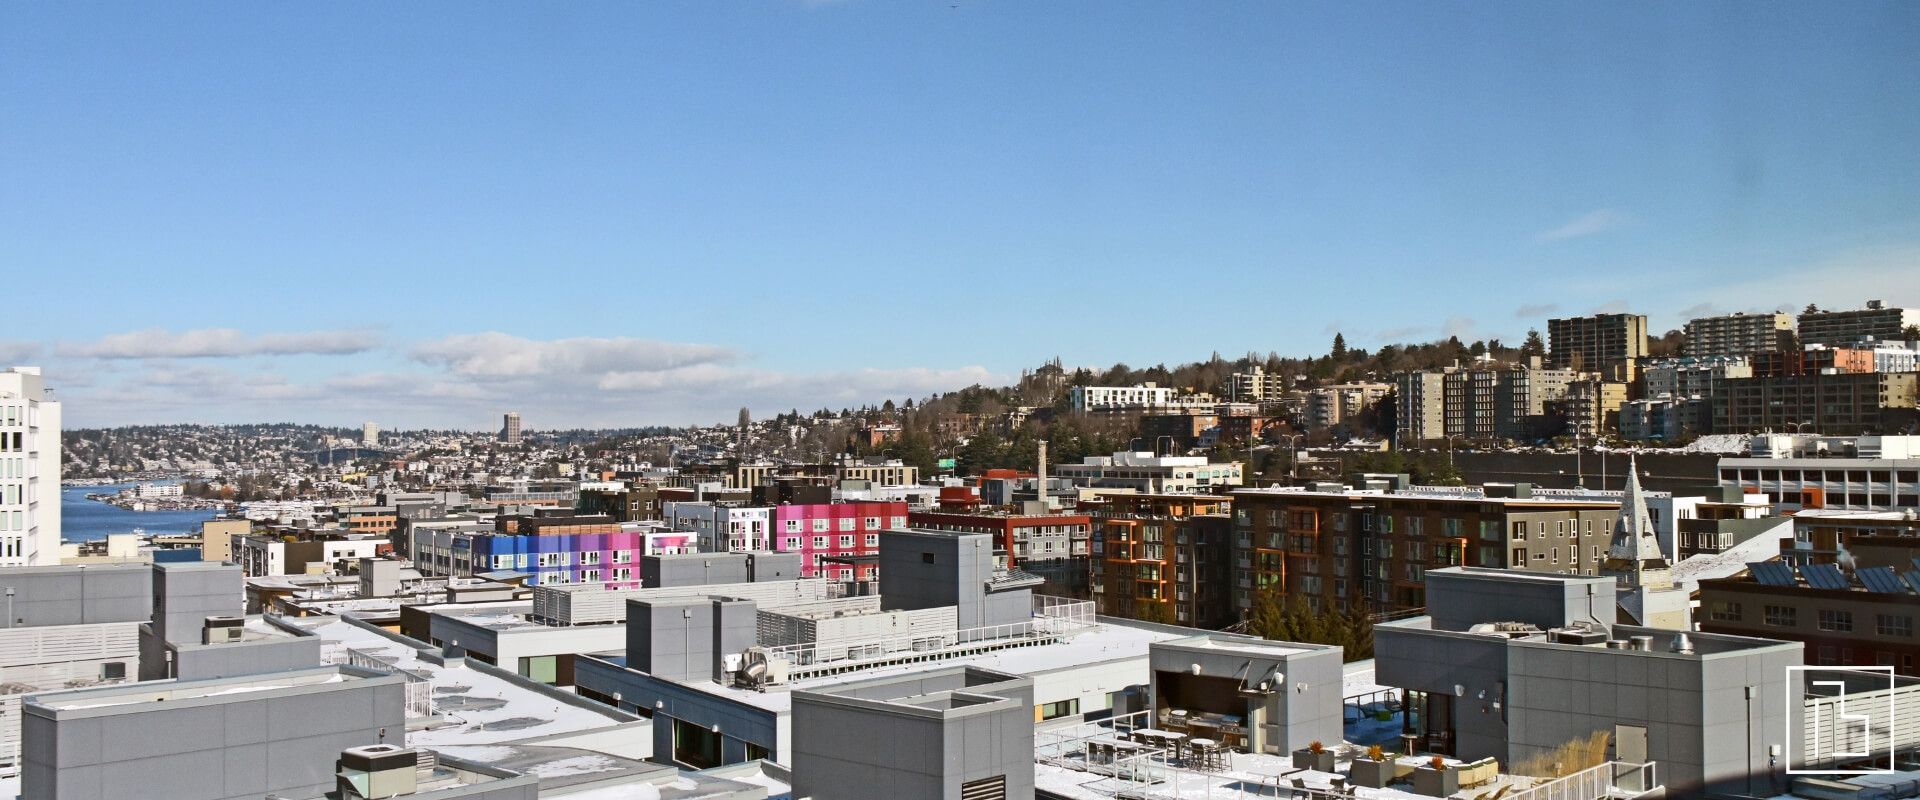 Seattle Mandatory Housing Affordability Seattle Neighborhood - Beachworks LLC